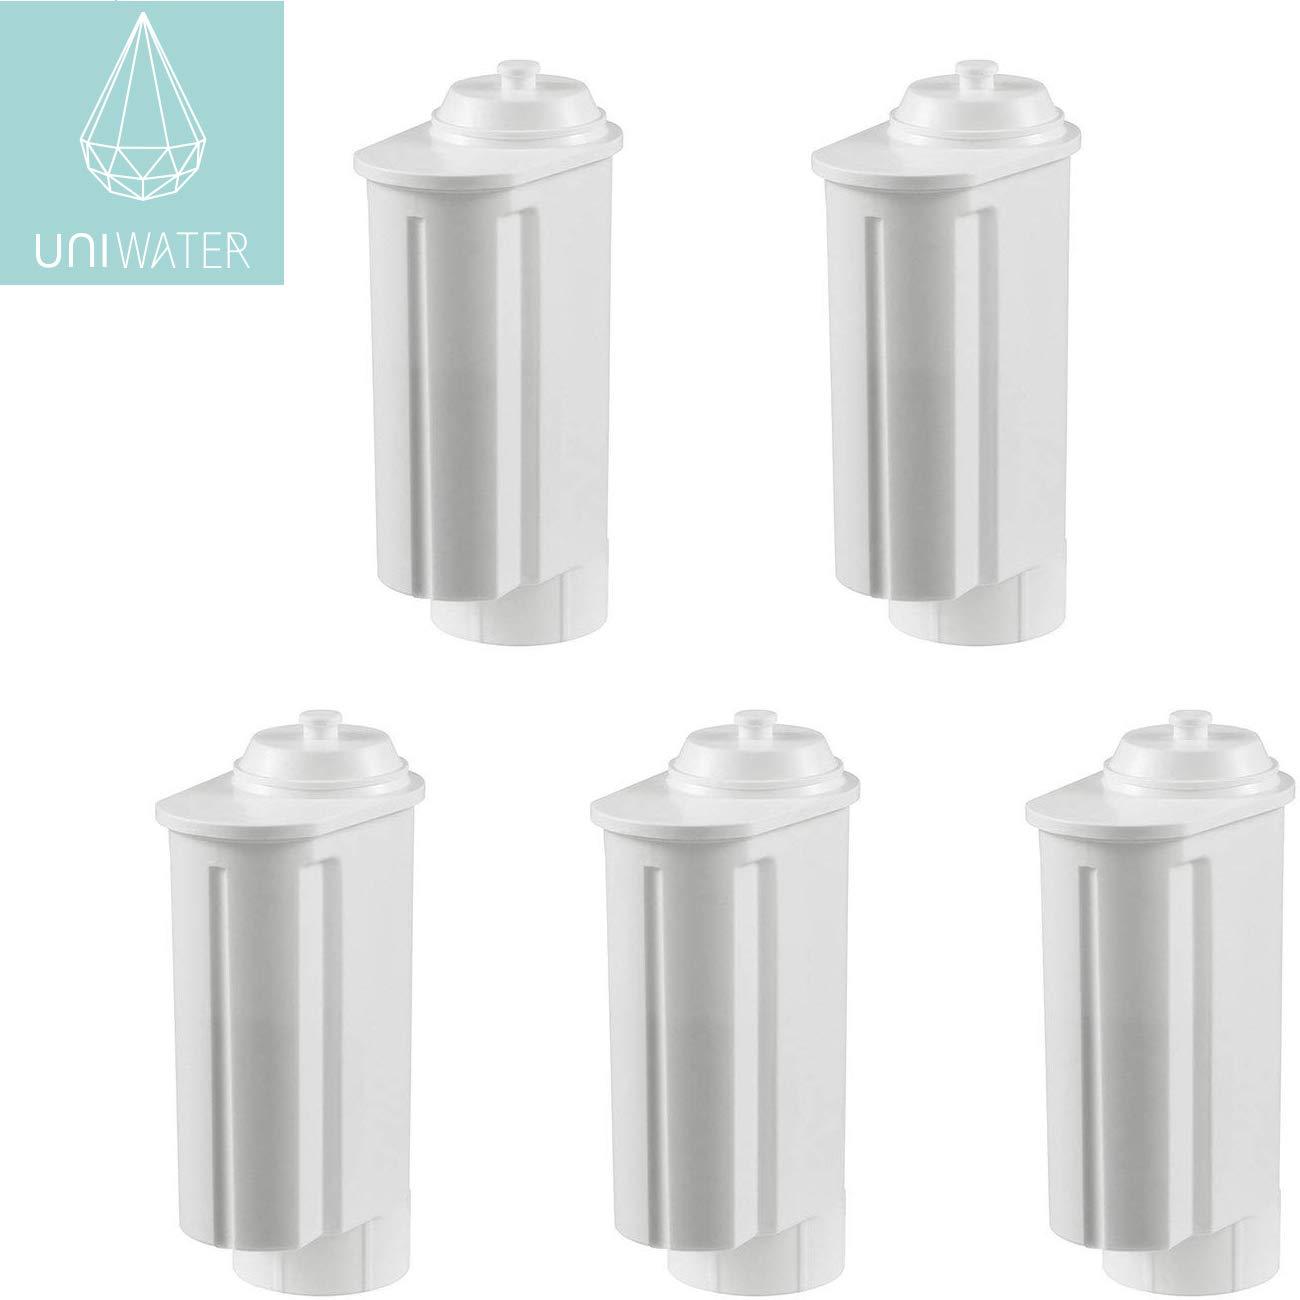 5-Pack Uniwater Water Filter Cartridges for Siemens/Bosch / Gaggenau/Neff / VeroBar-Professional/Intenza